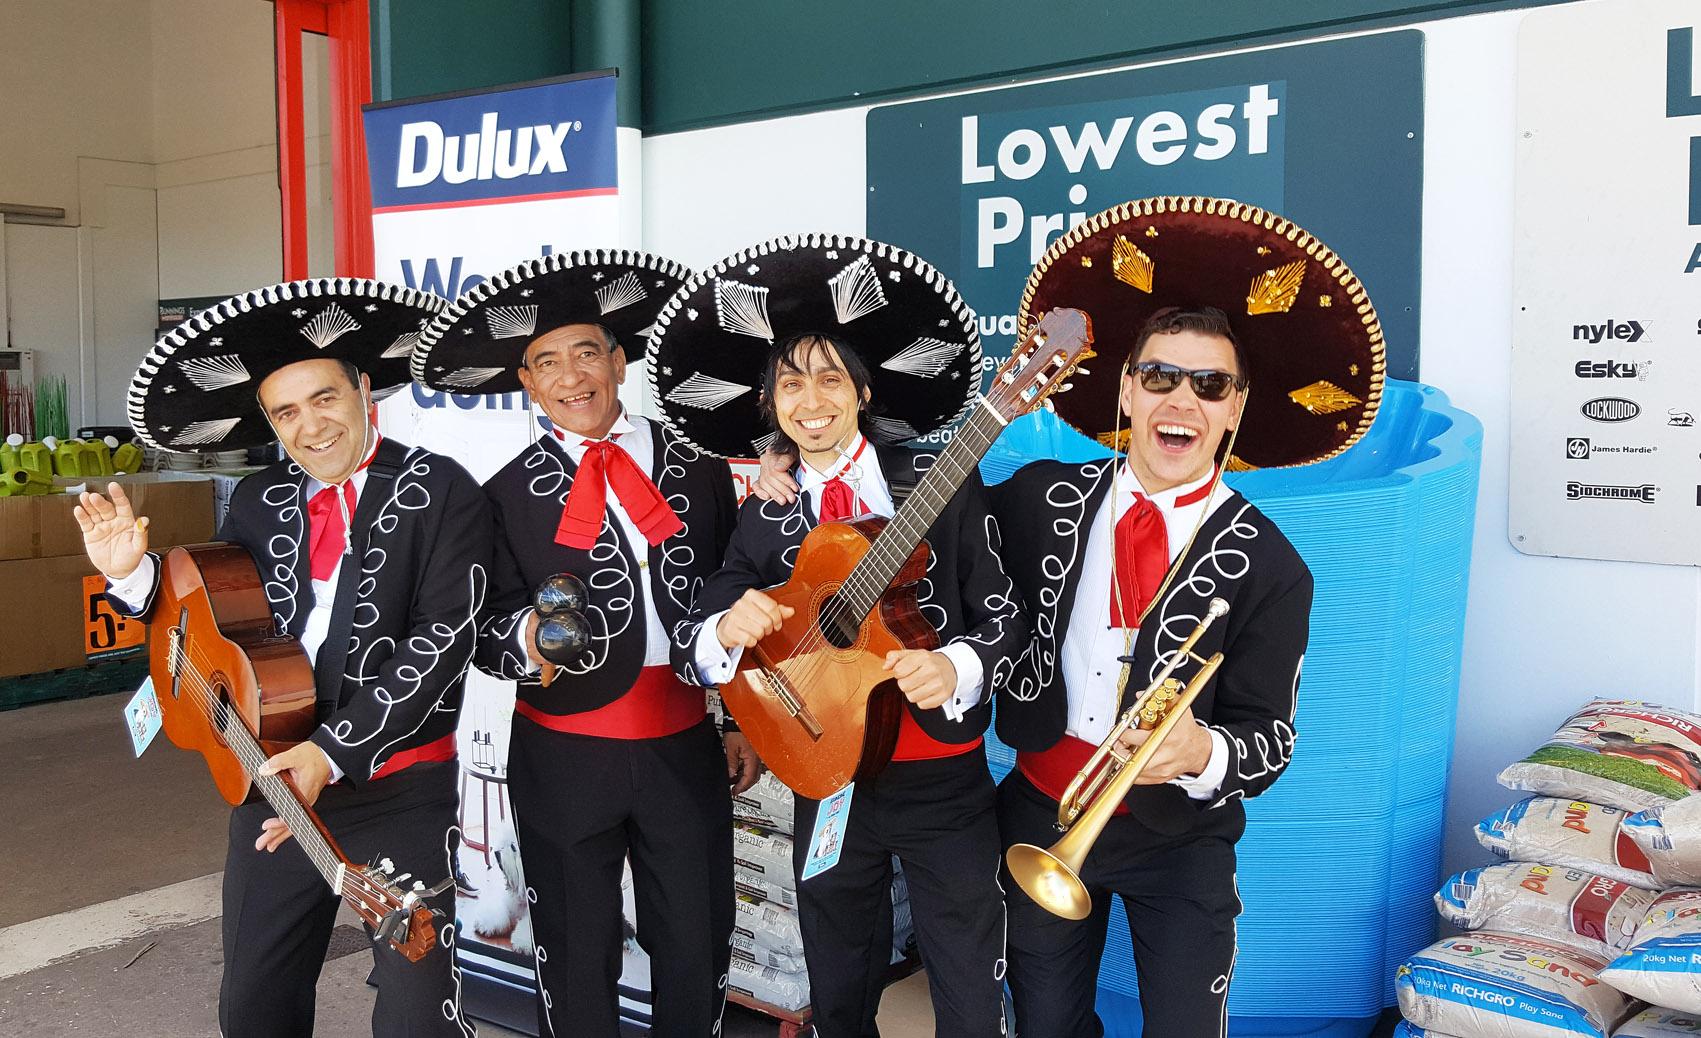 bunnings australia dulux paints mexican mariachi music australia sydney, melbourne, adelaide, perth, darwin, brisbane, gold coast, canberra, singapore, hong kong, dubai, japan